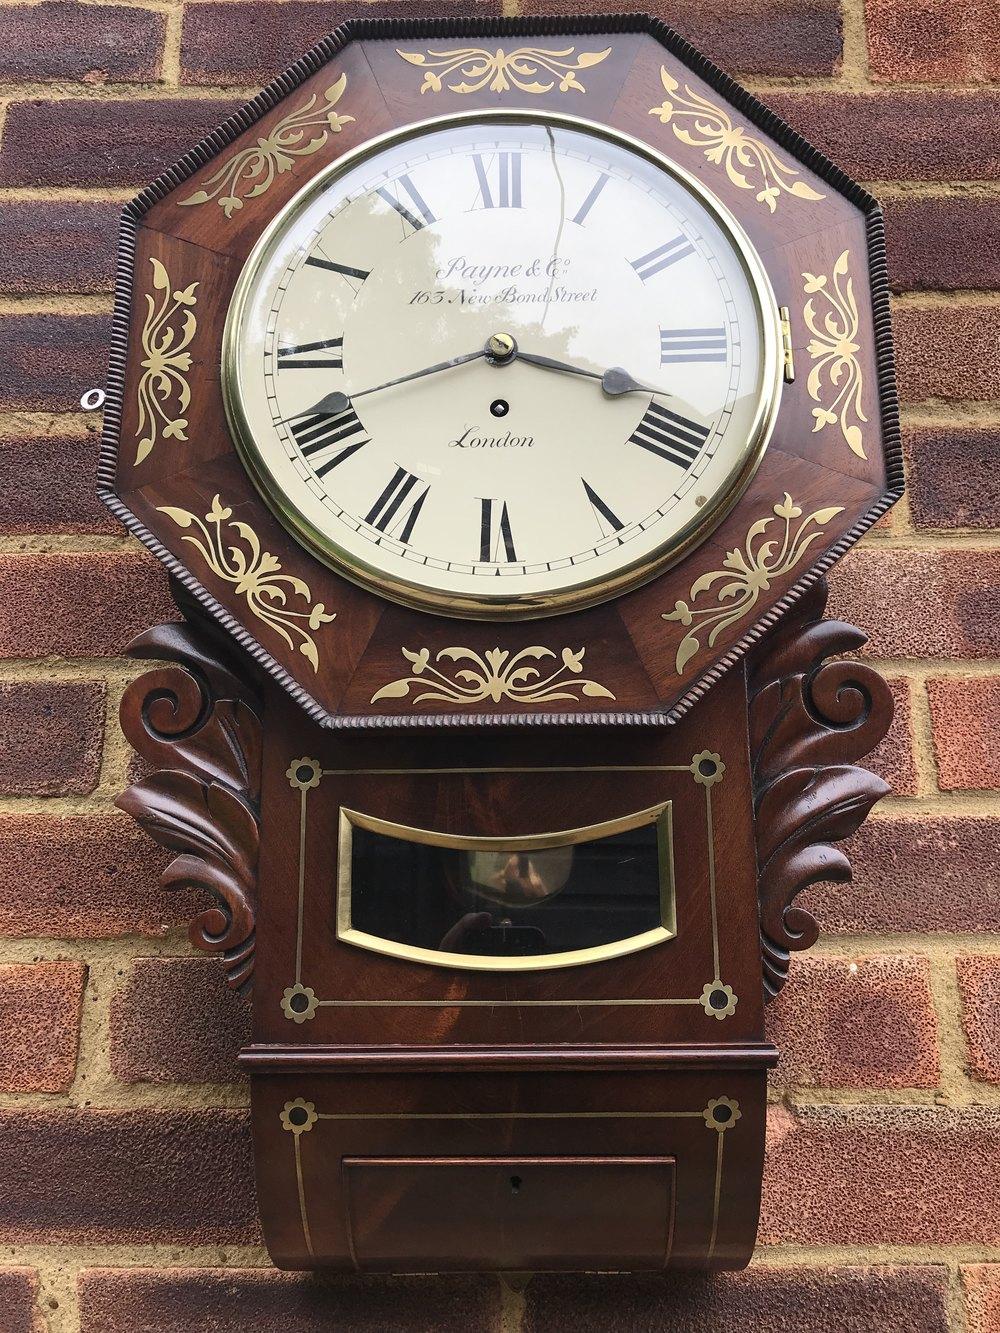 Antique Fusee Wall Clock Antique Wall Clocks Antique Wall Clock Wall Clock